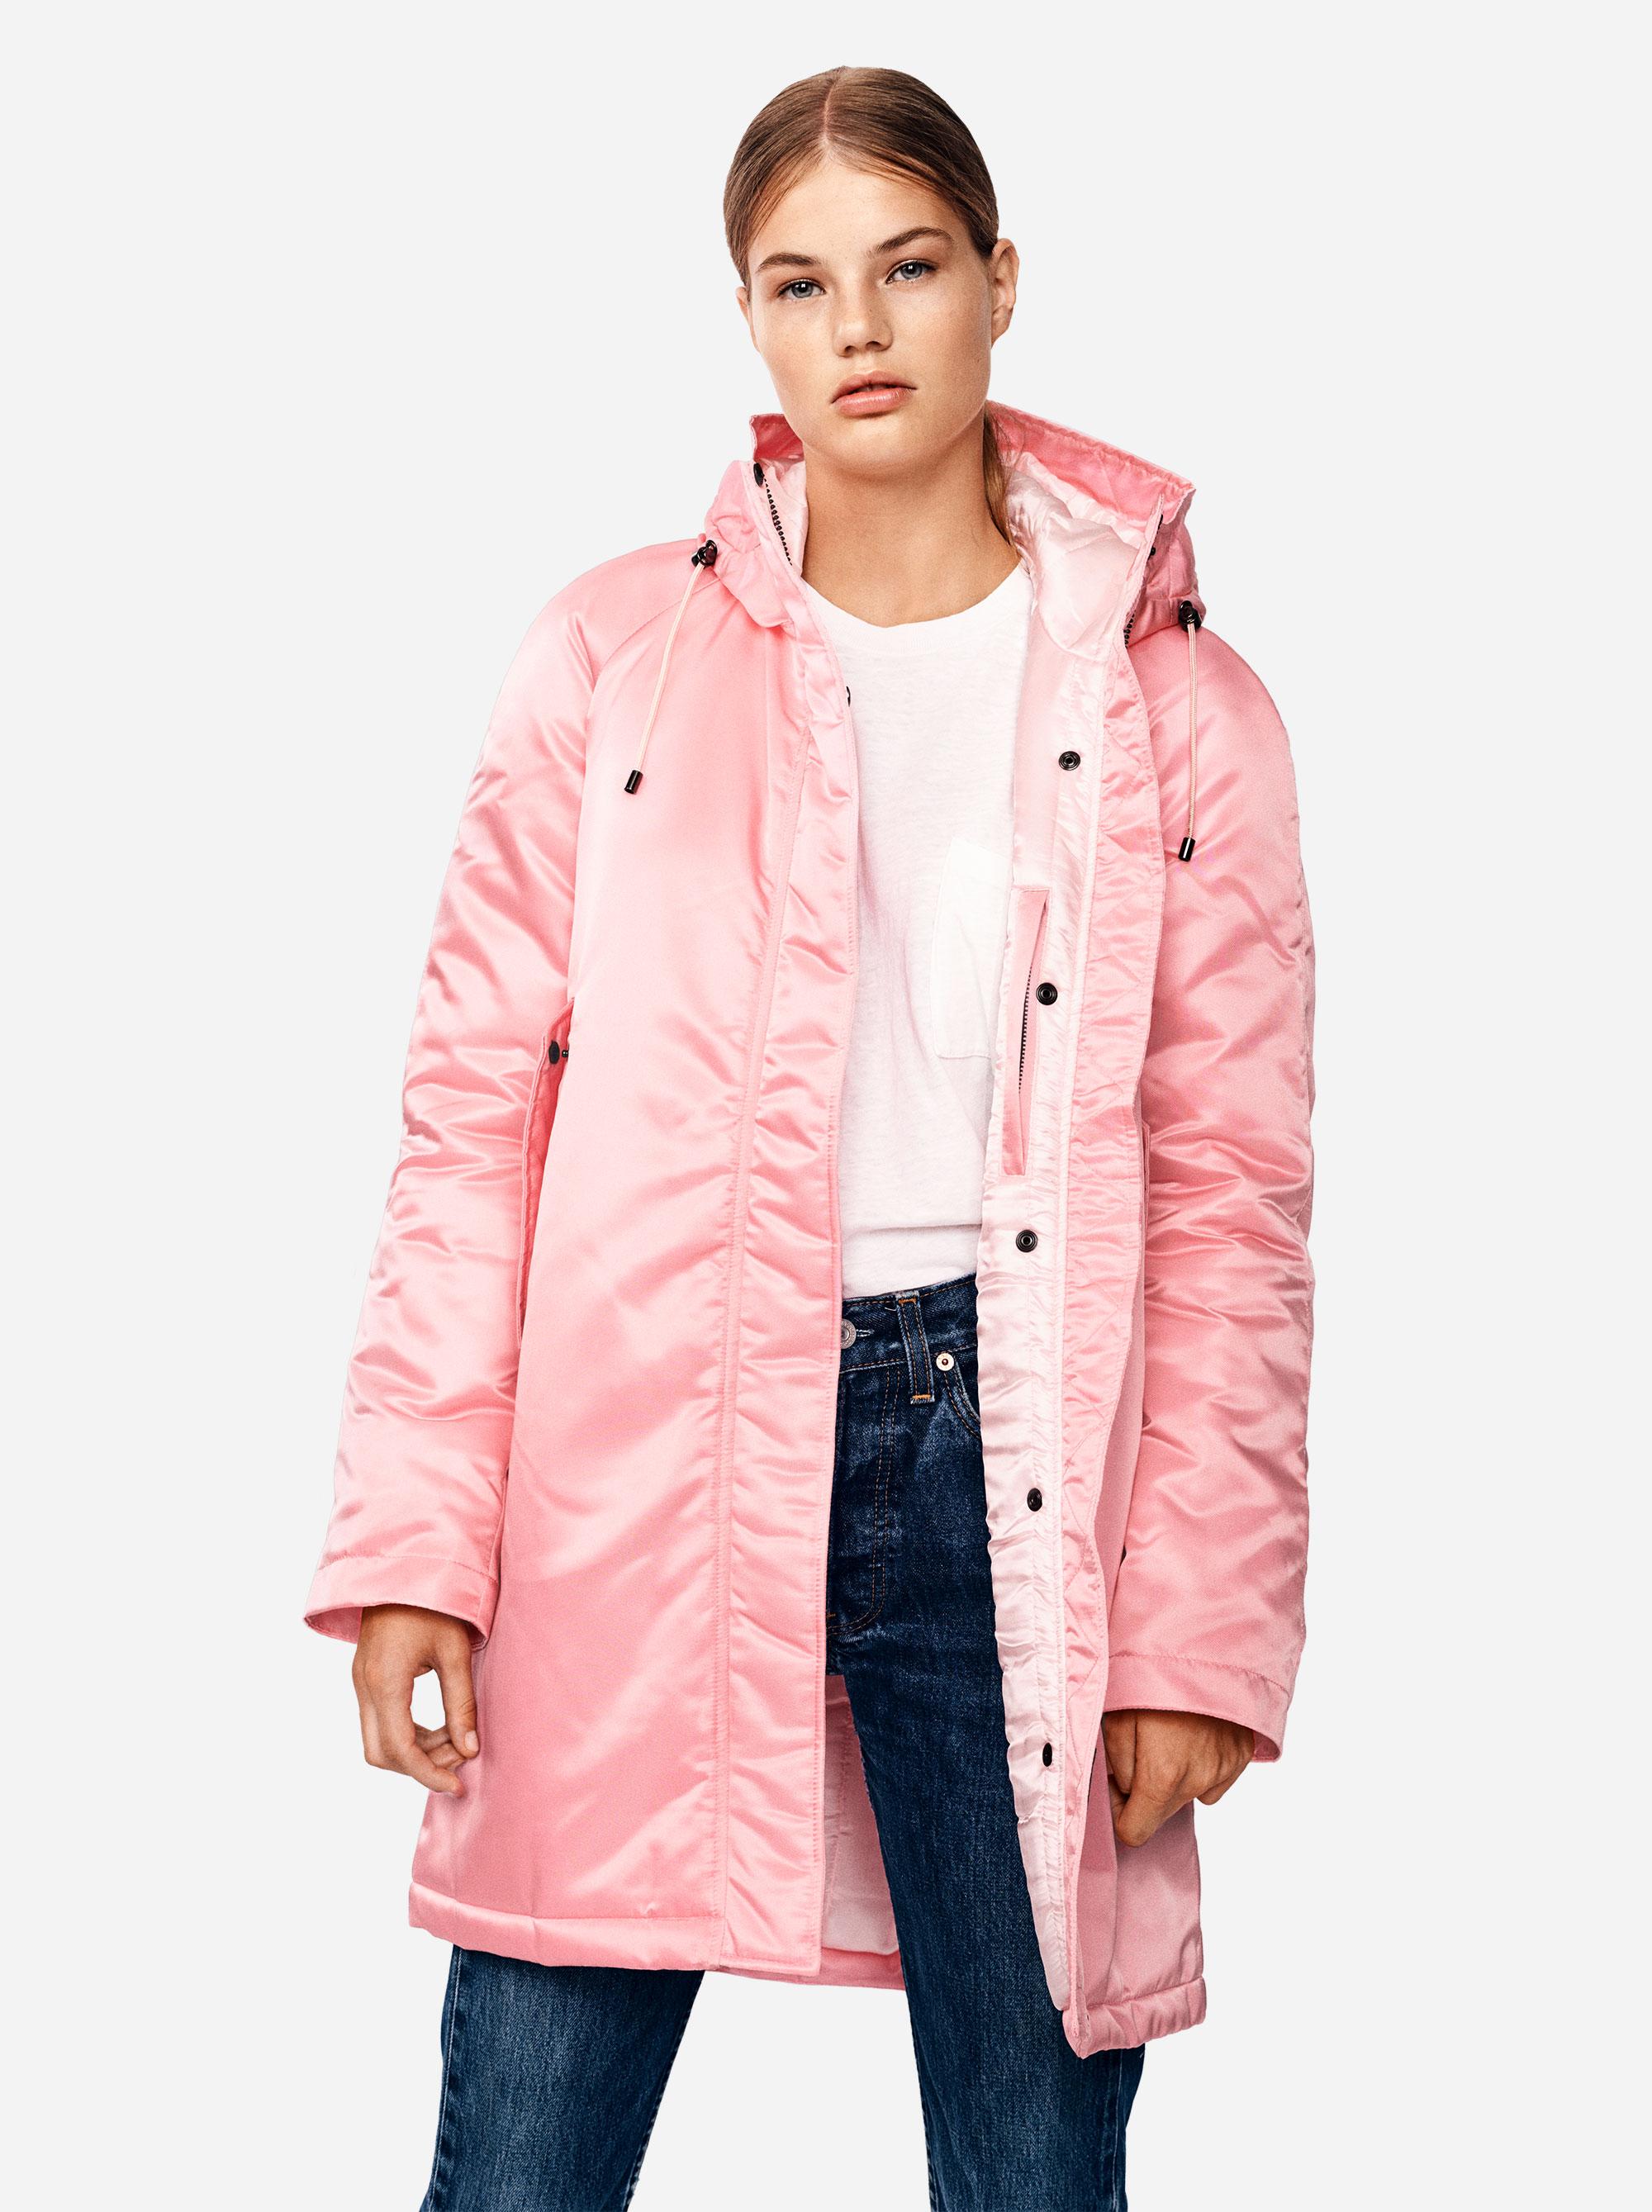 Teym - The Parka - Women - Pink - 1